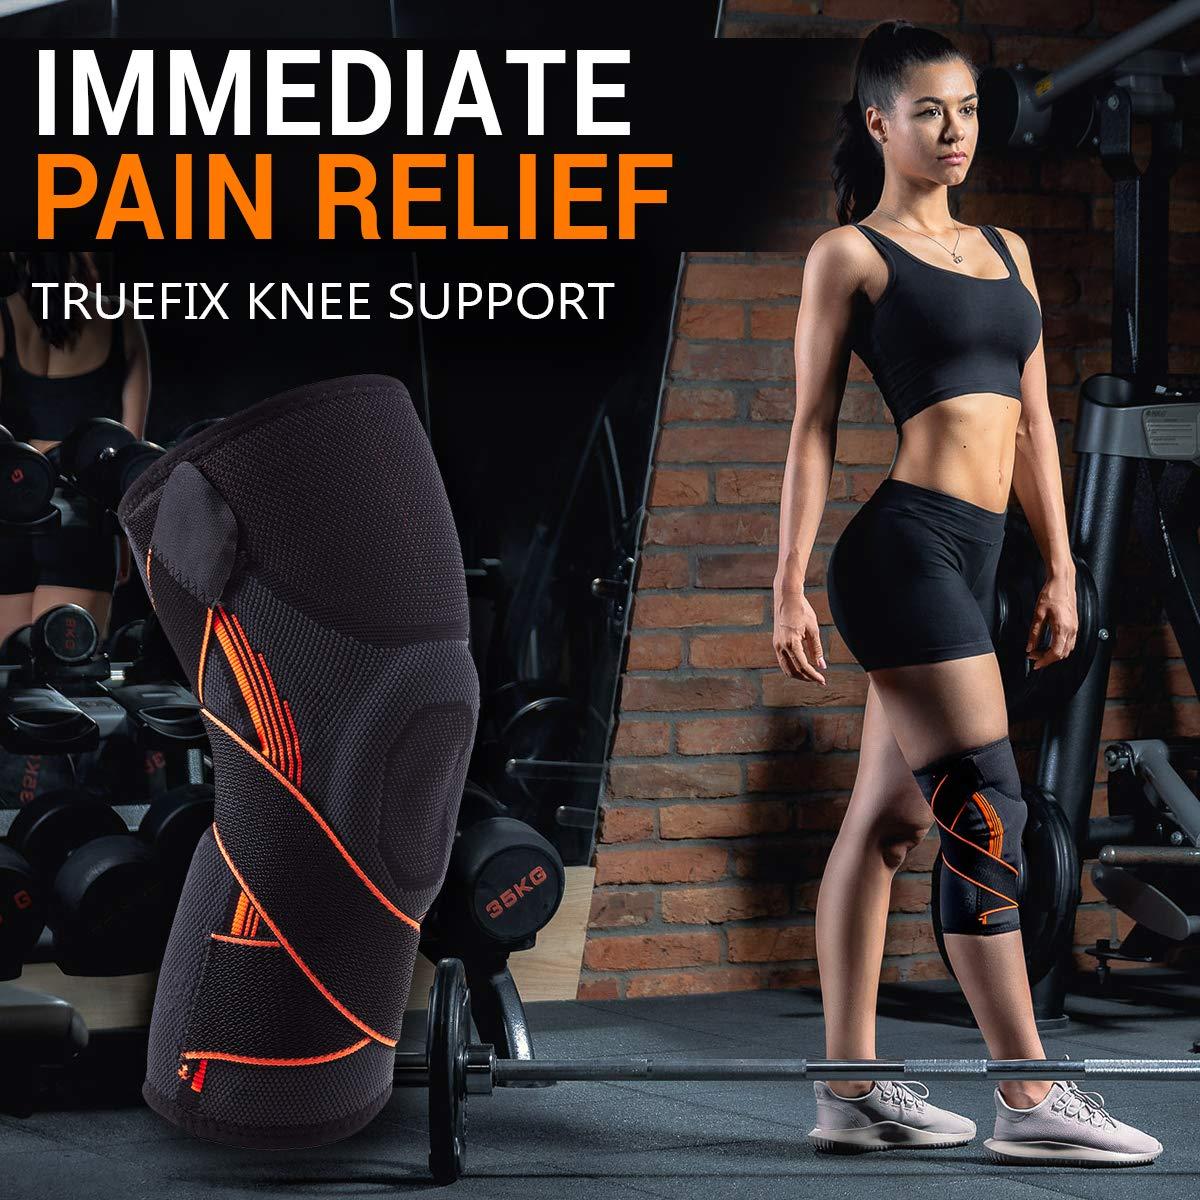 s TrueFix Knee Support Knee Brace Crossfit,Sports,Arthritis Support Brace,Knee Brace for Injury Recovery,Meniscus Tear,Running,Squats